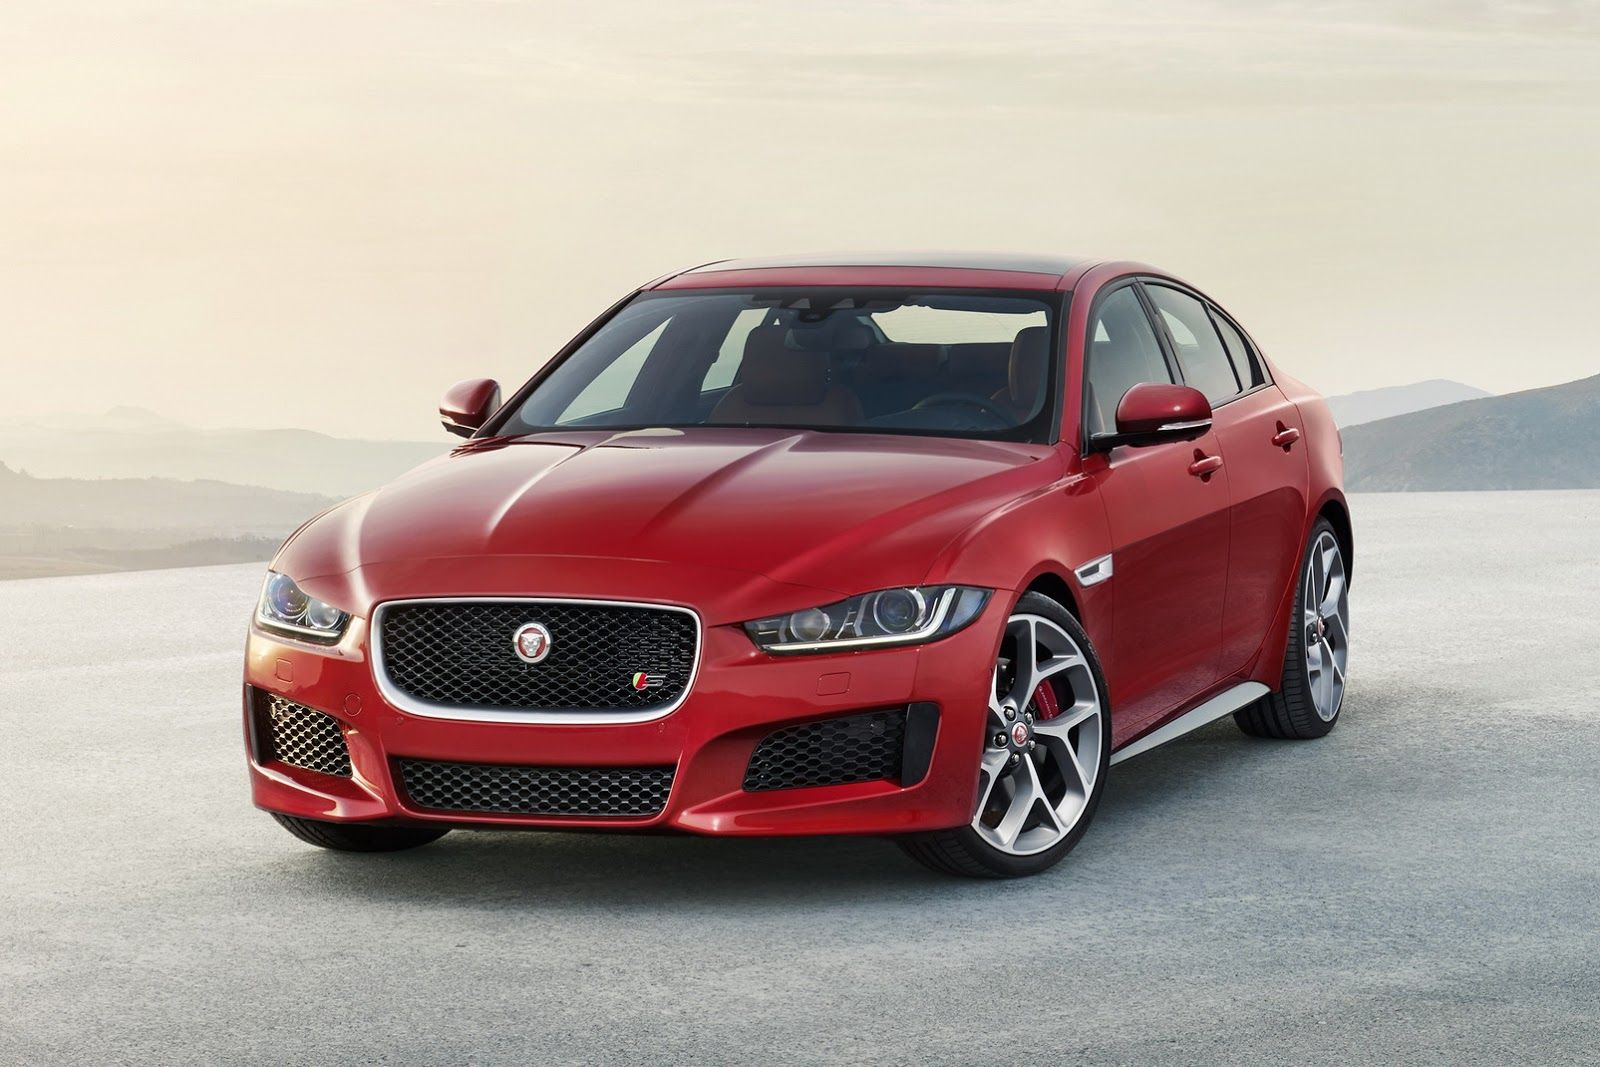 New 2016 Jaguar Xe Sports Saloon 52 Hd Photos And Full Details Updated Carscoops Jaguar Xe New Jaguar Jaguar Car